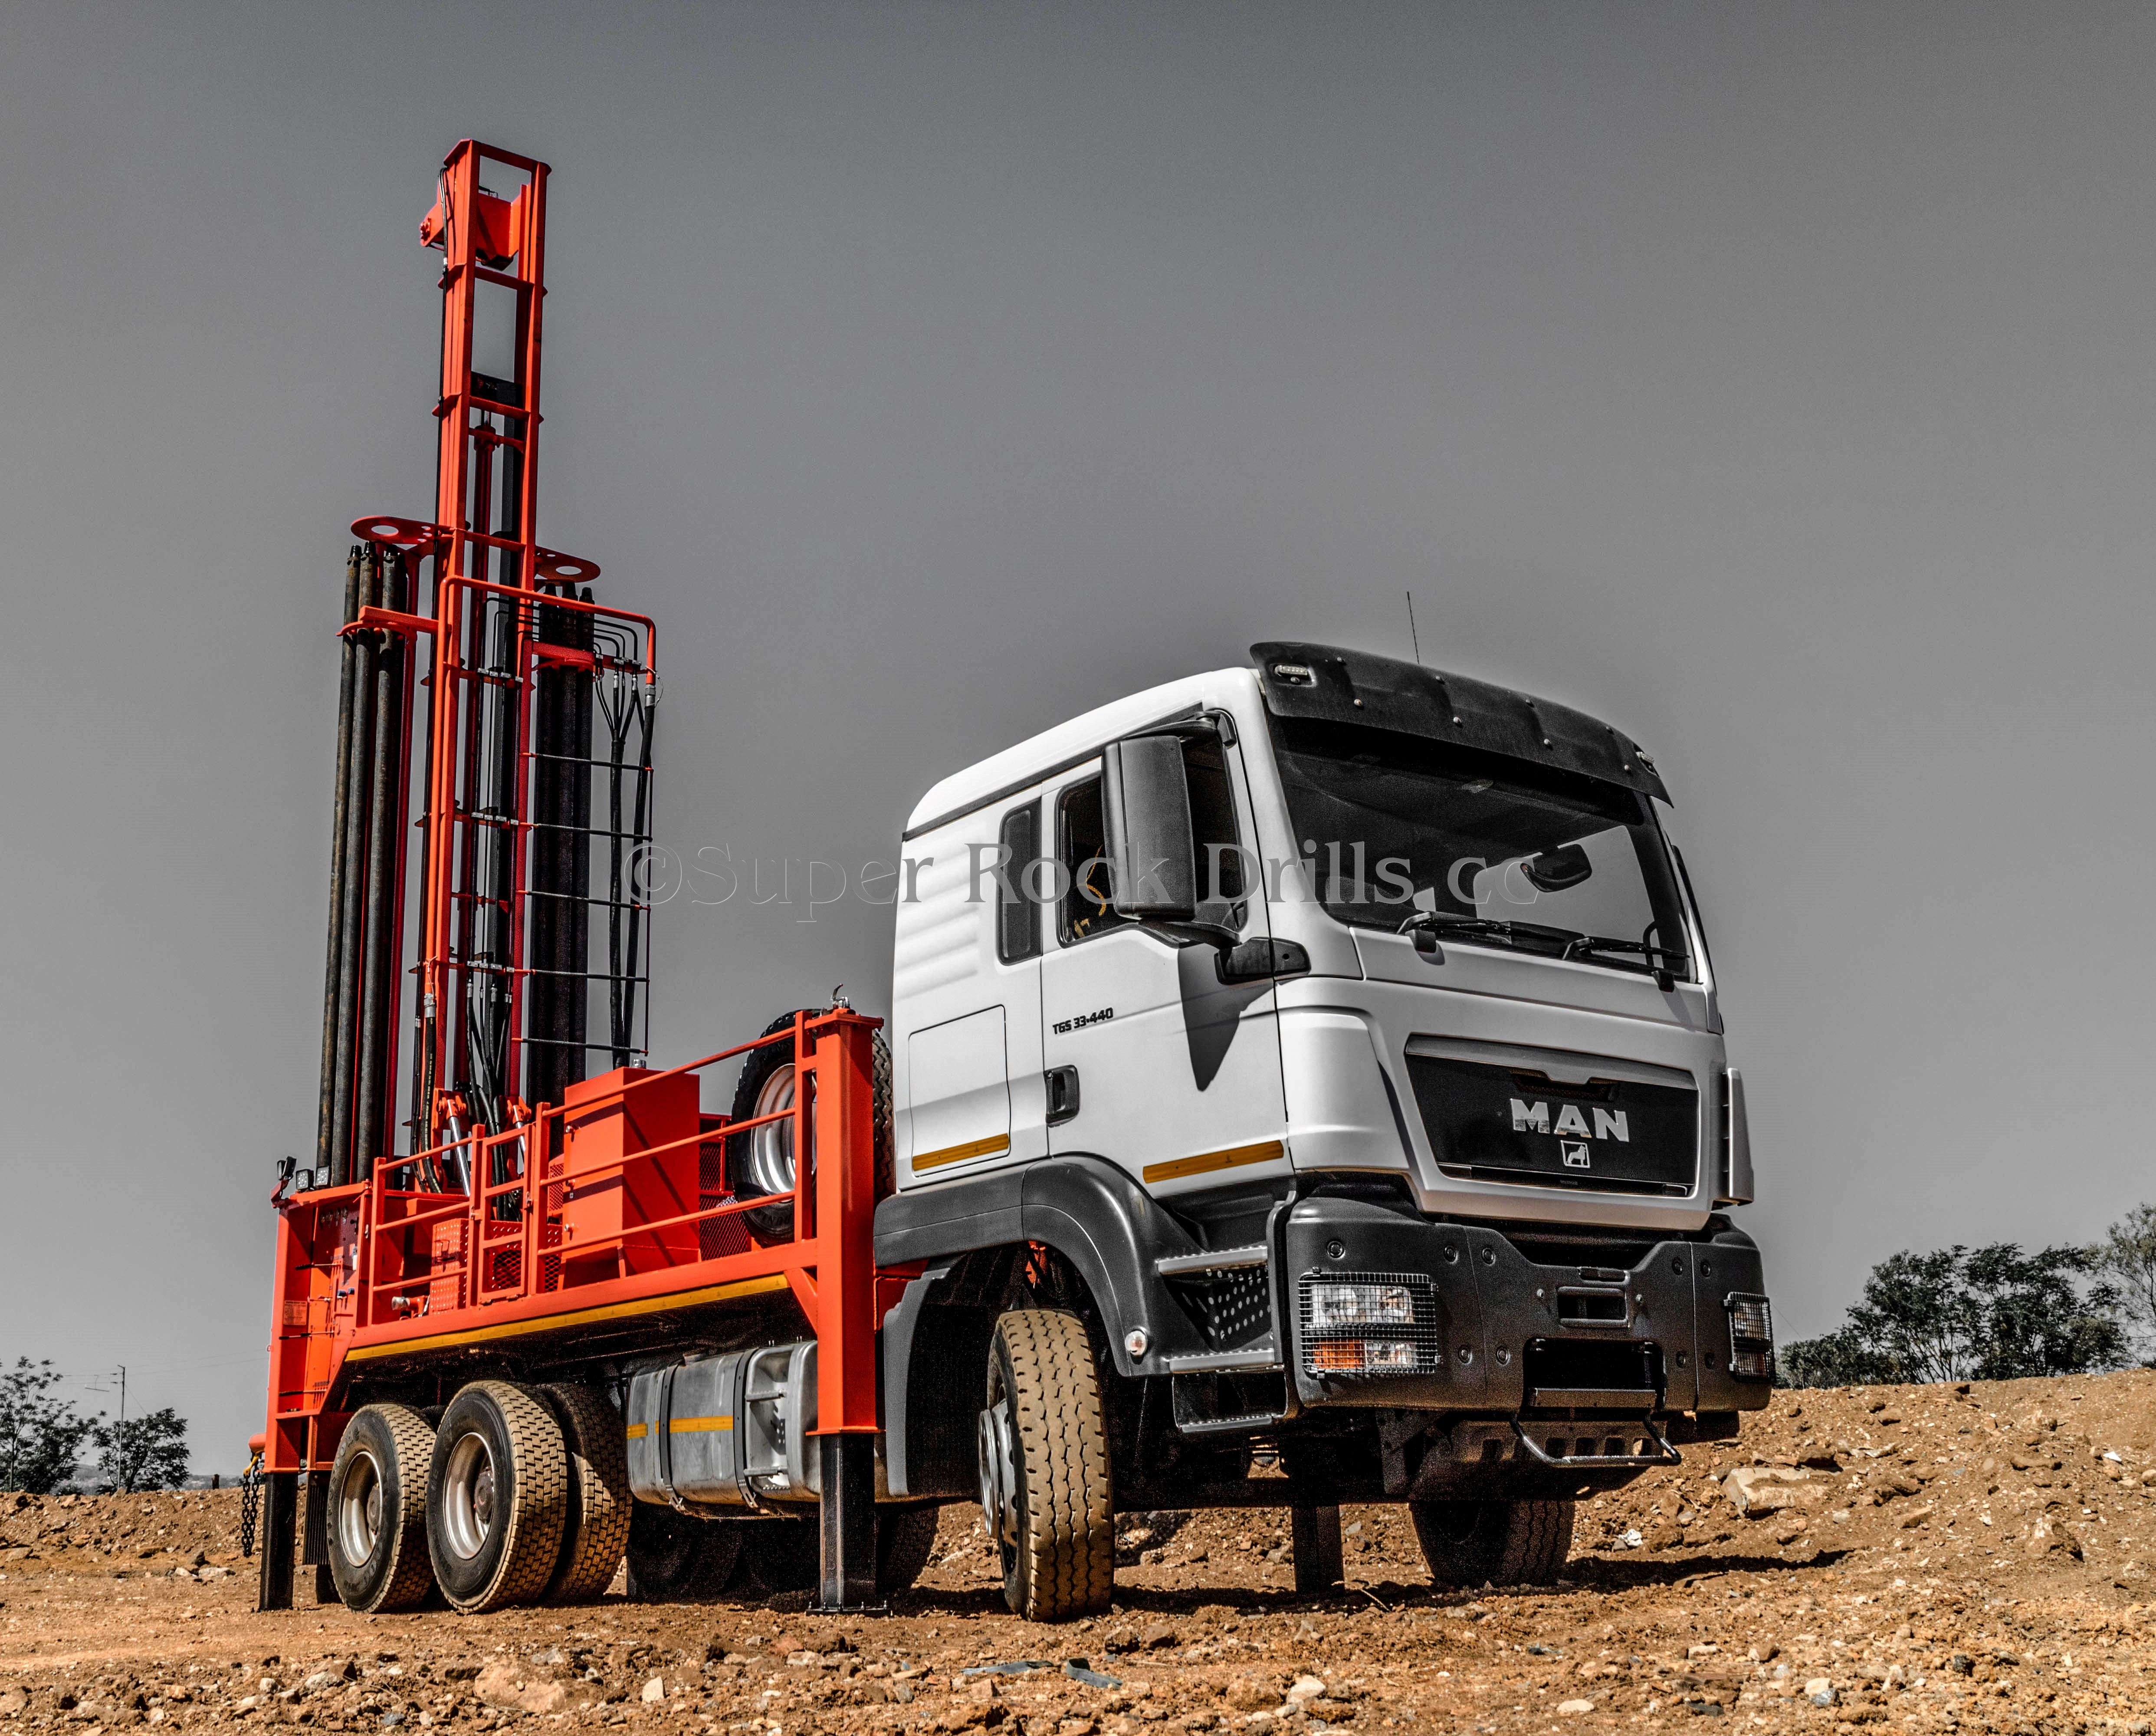 A Super Rock Drills Sr1000 Water Well Drill Rig Water Well Drilling Drilling Rig Well Drilling